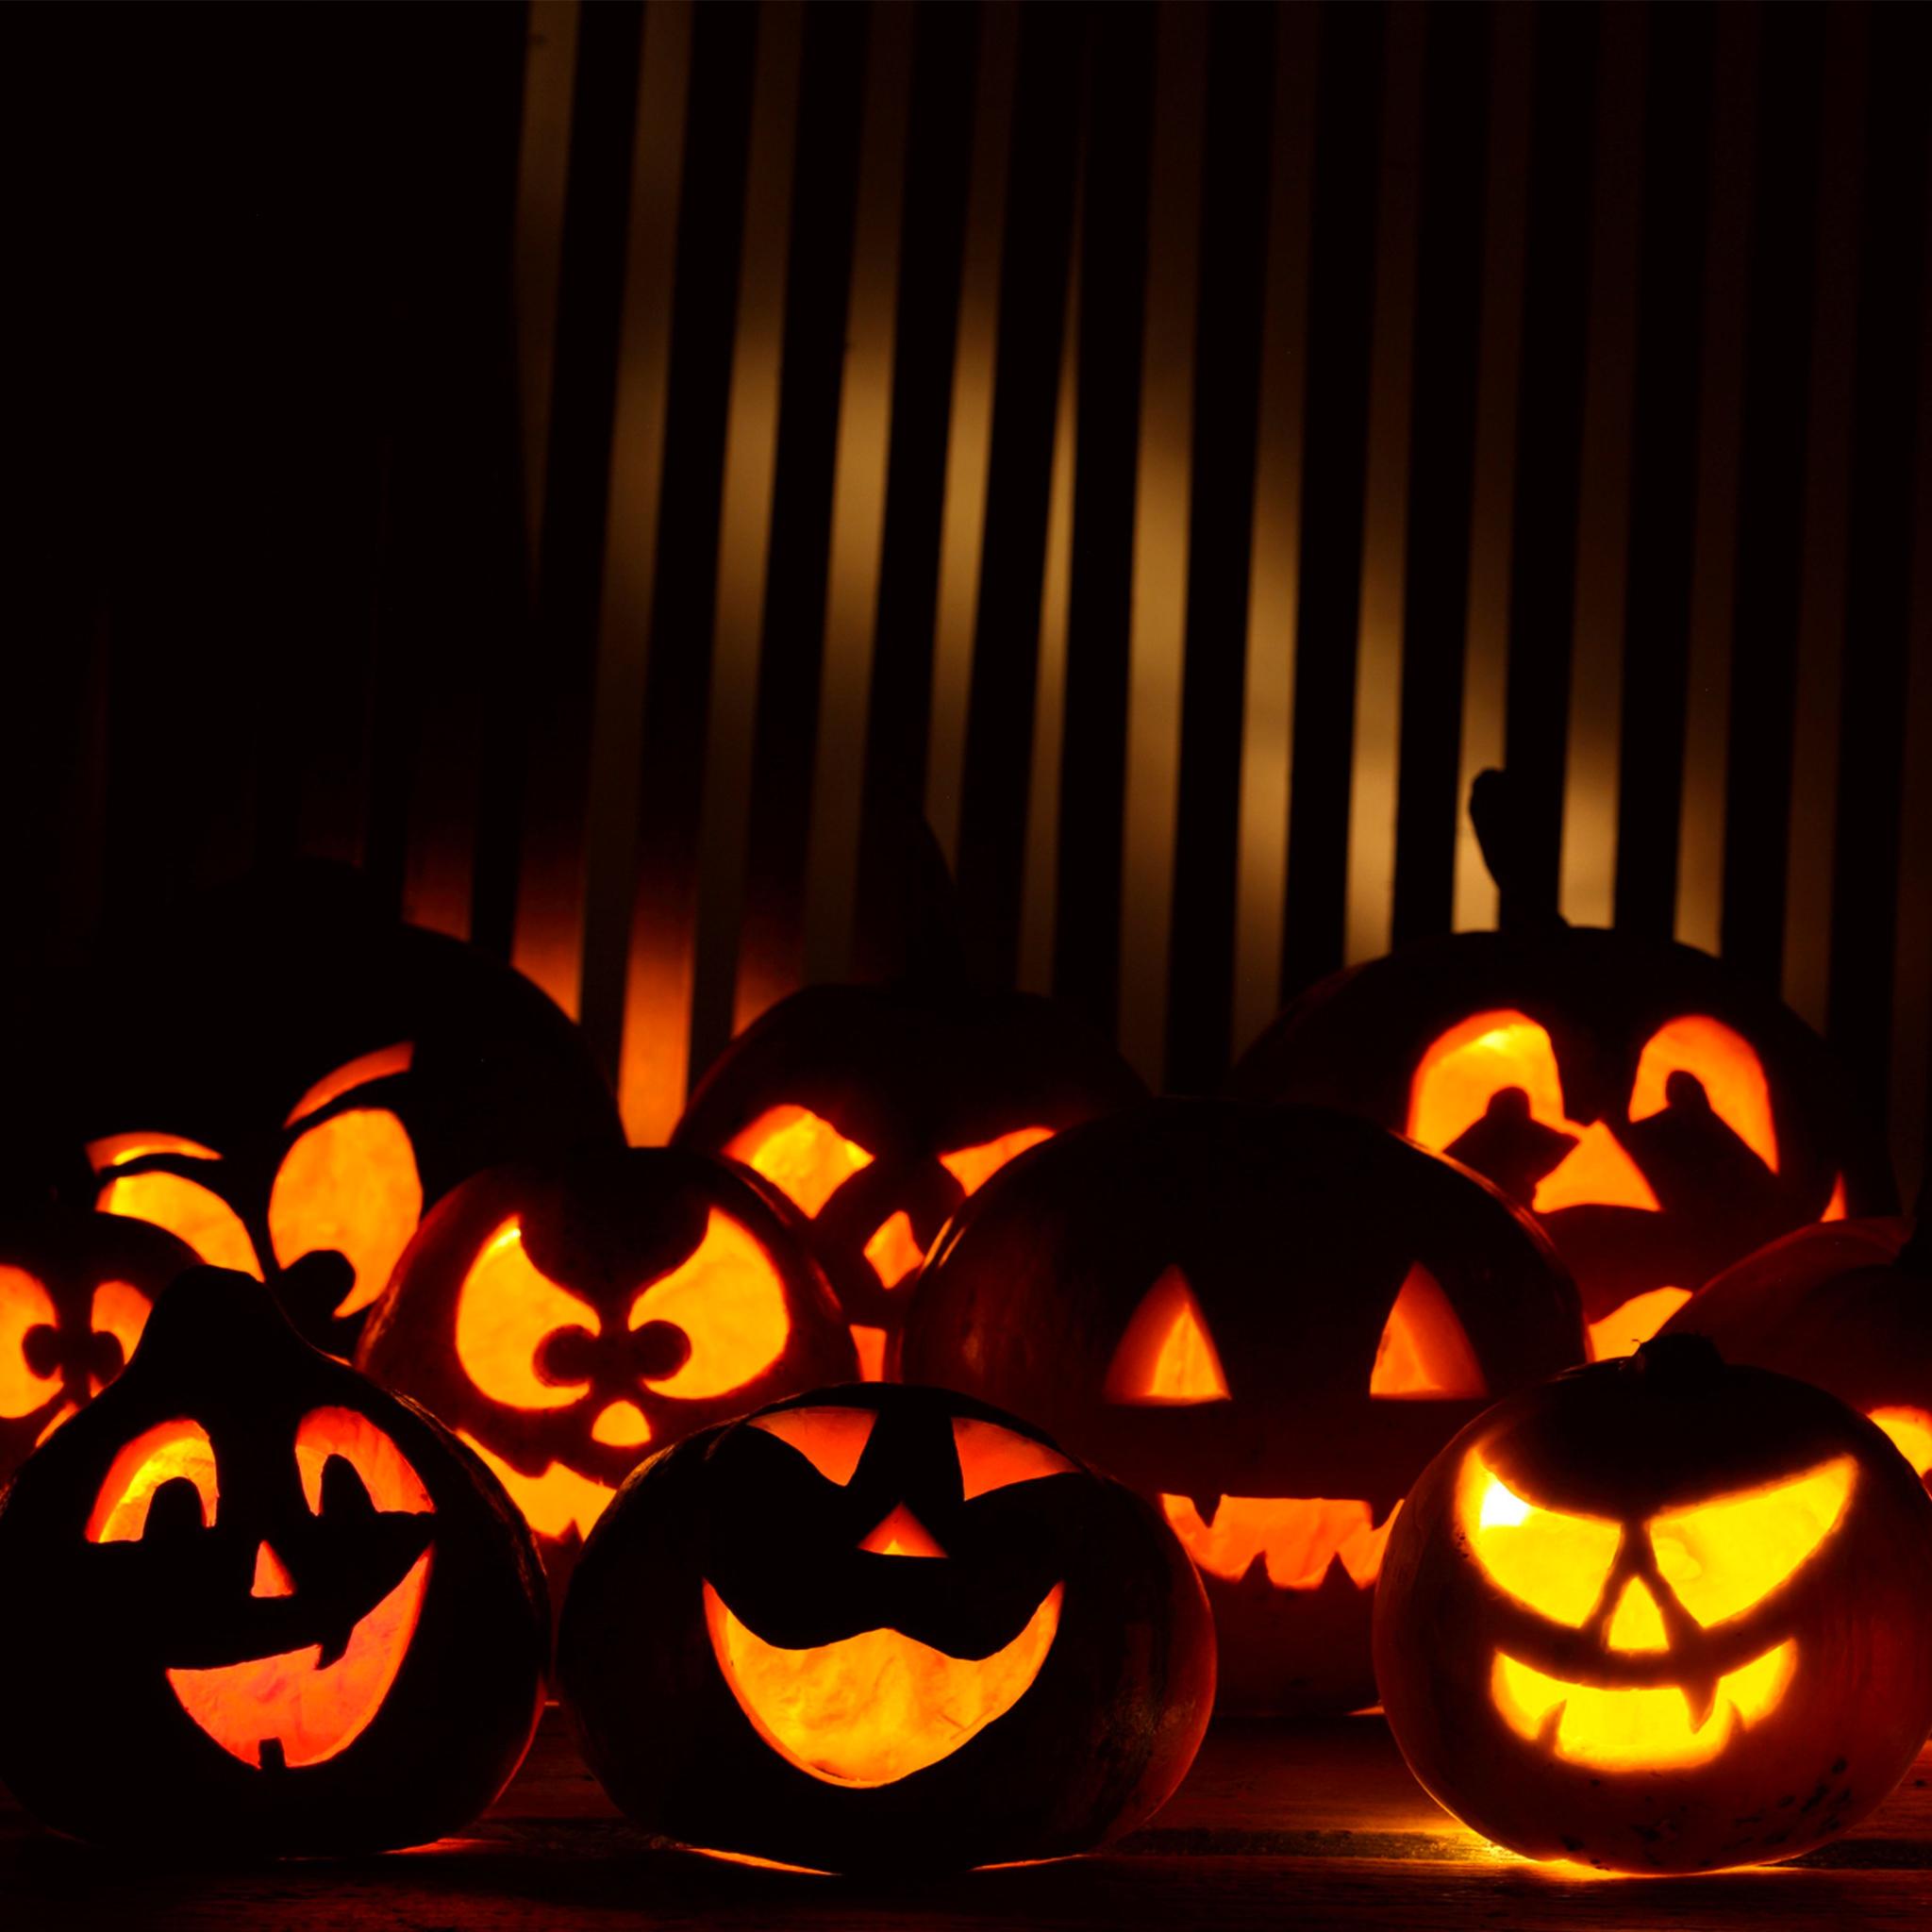 Funny Pumpkins Halloween 3Wallpapers iPad Retina Funny Pumpkins Halloween   iPad Retina